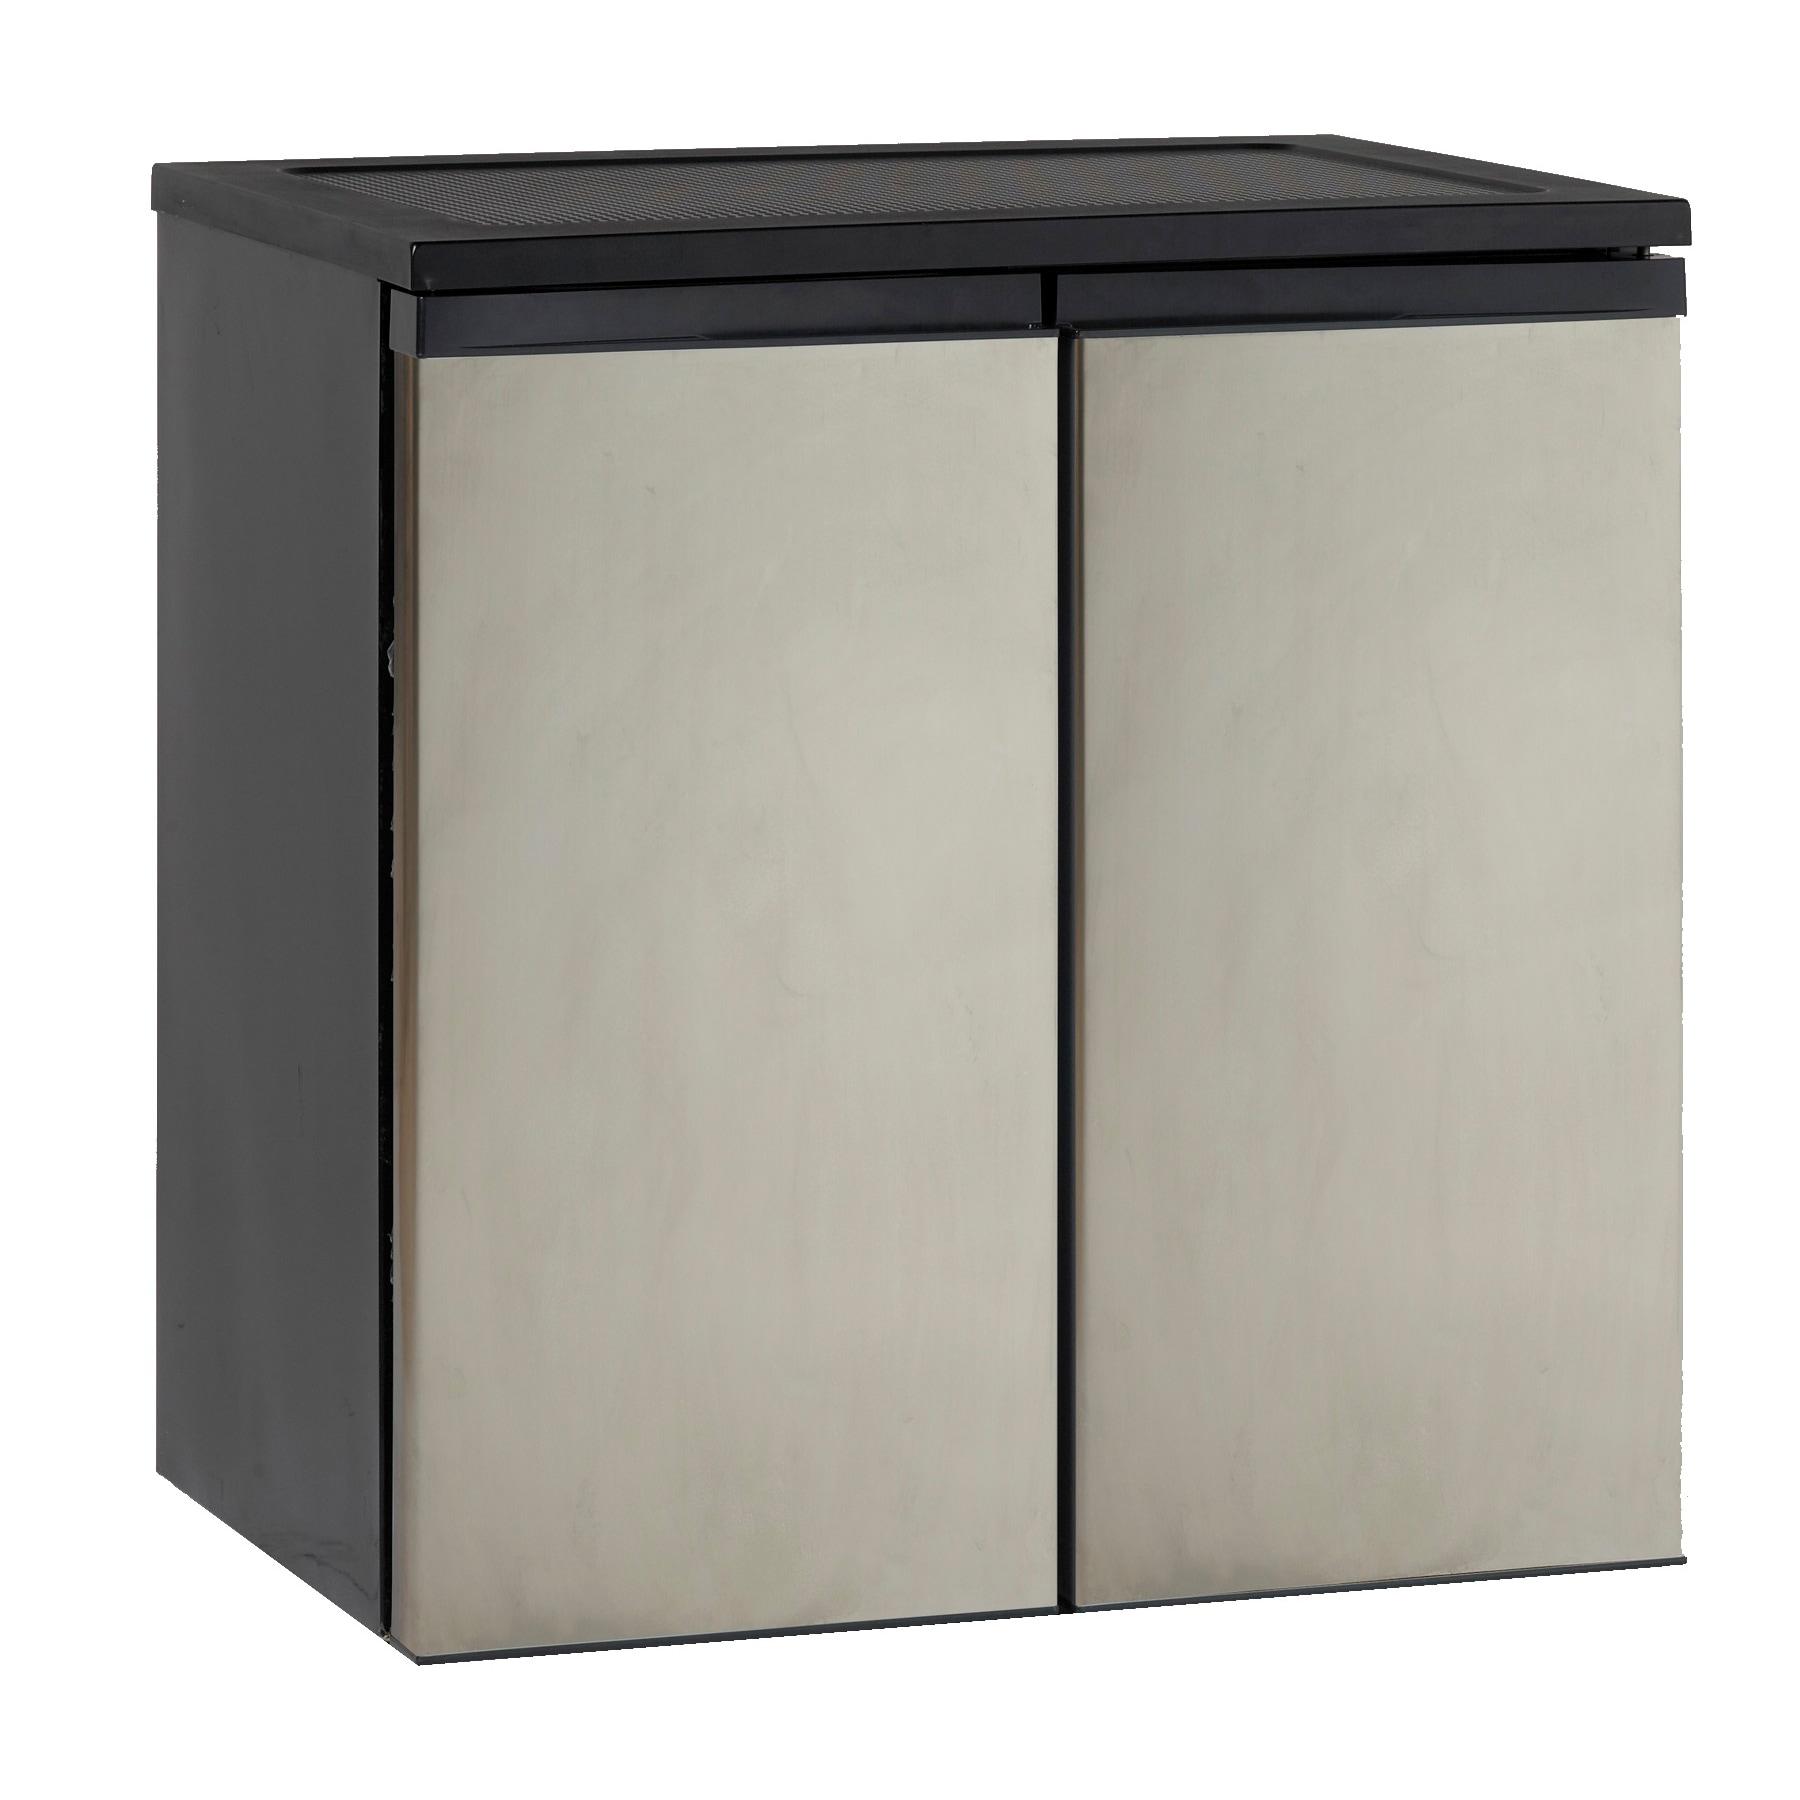 Avanti Stainless Steel 5.5-cubic Foot Side-by-Side Refrig...